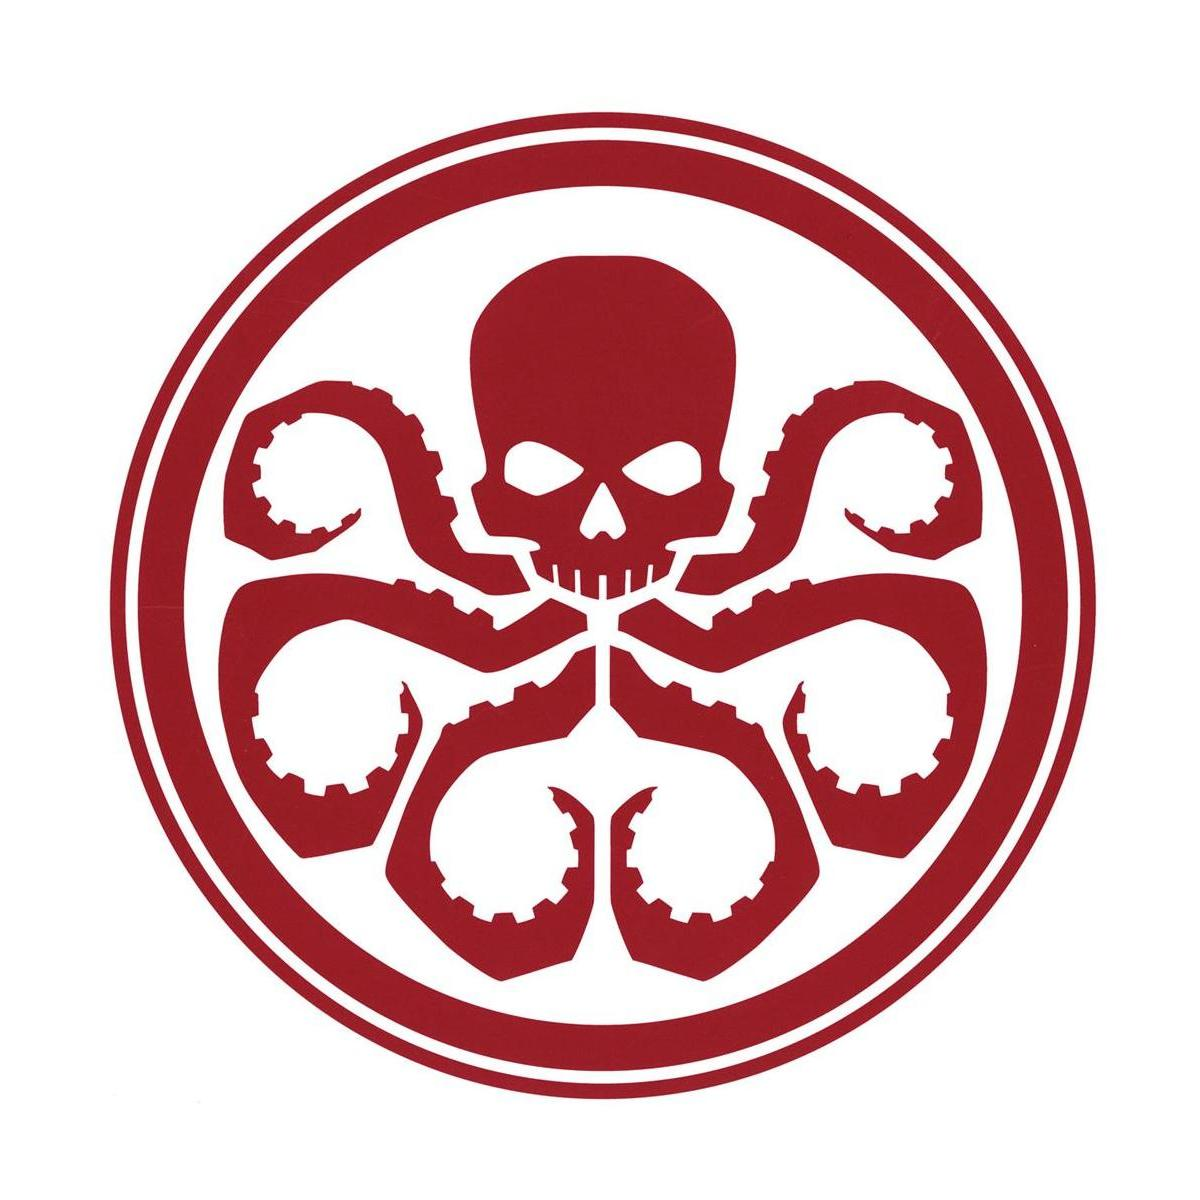 Nazi ss skull symbol more information djekova hydra symbol nazi ss skull symbol biocorpaavc Image collections